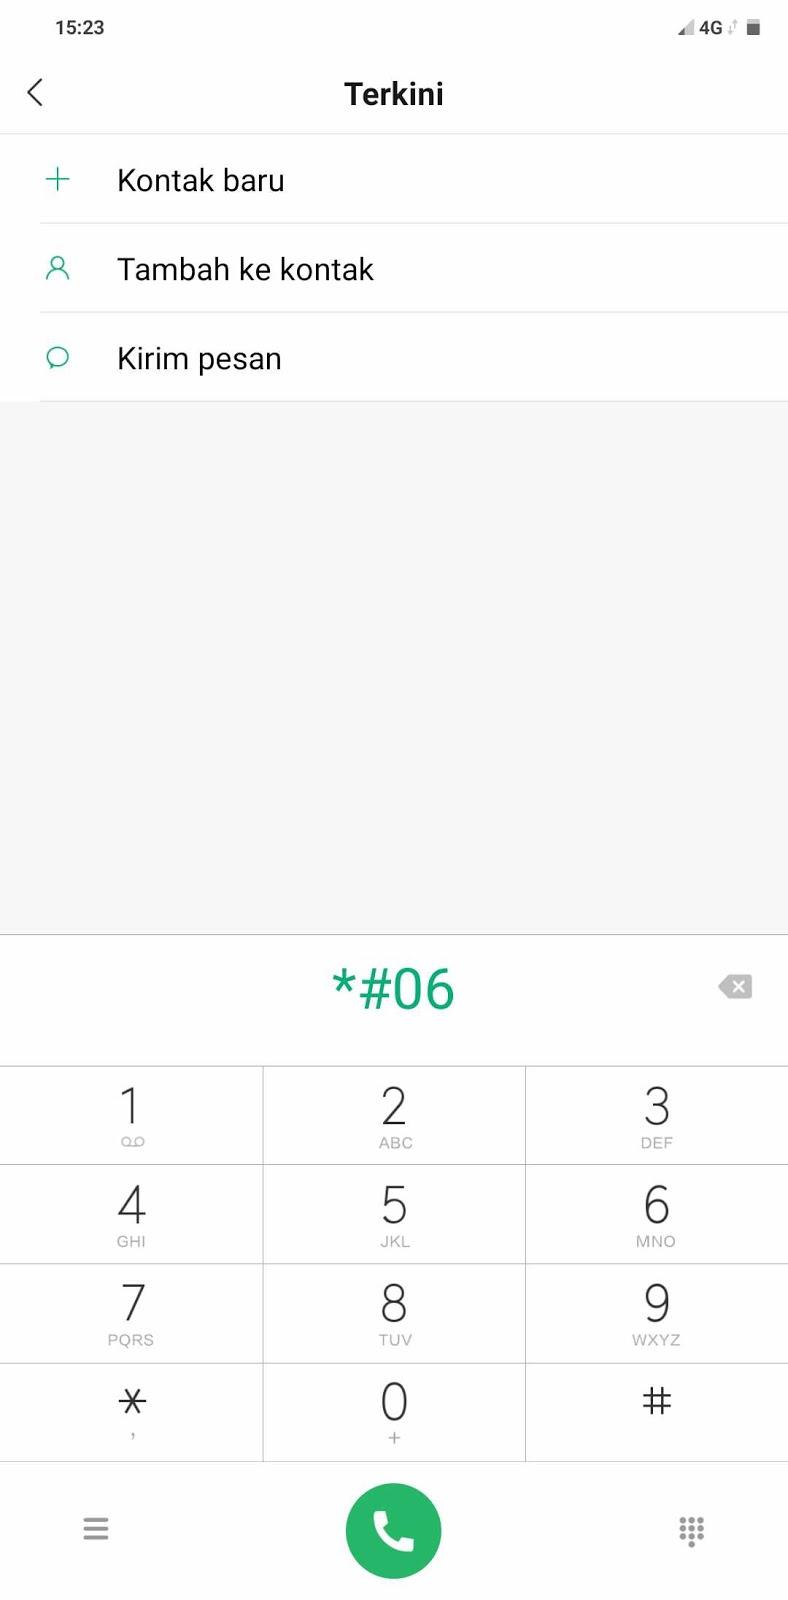 Cara Lengkap Cek Kode Imei di Semua Xiaomi Android dengan Mudah